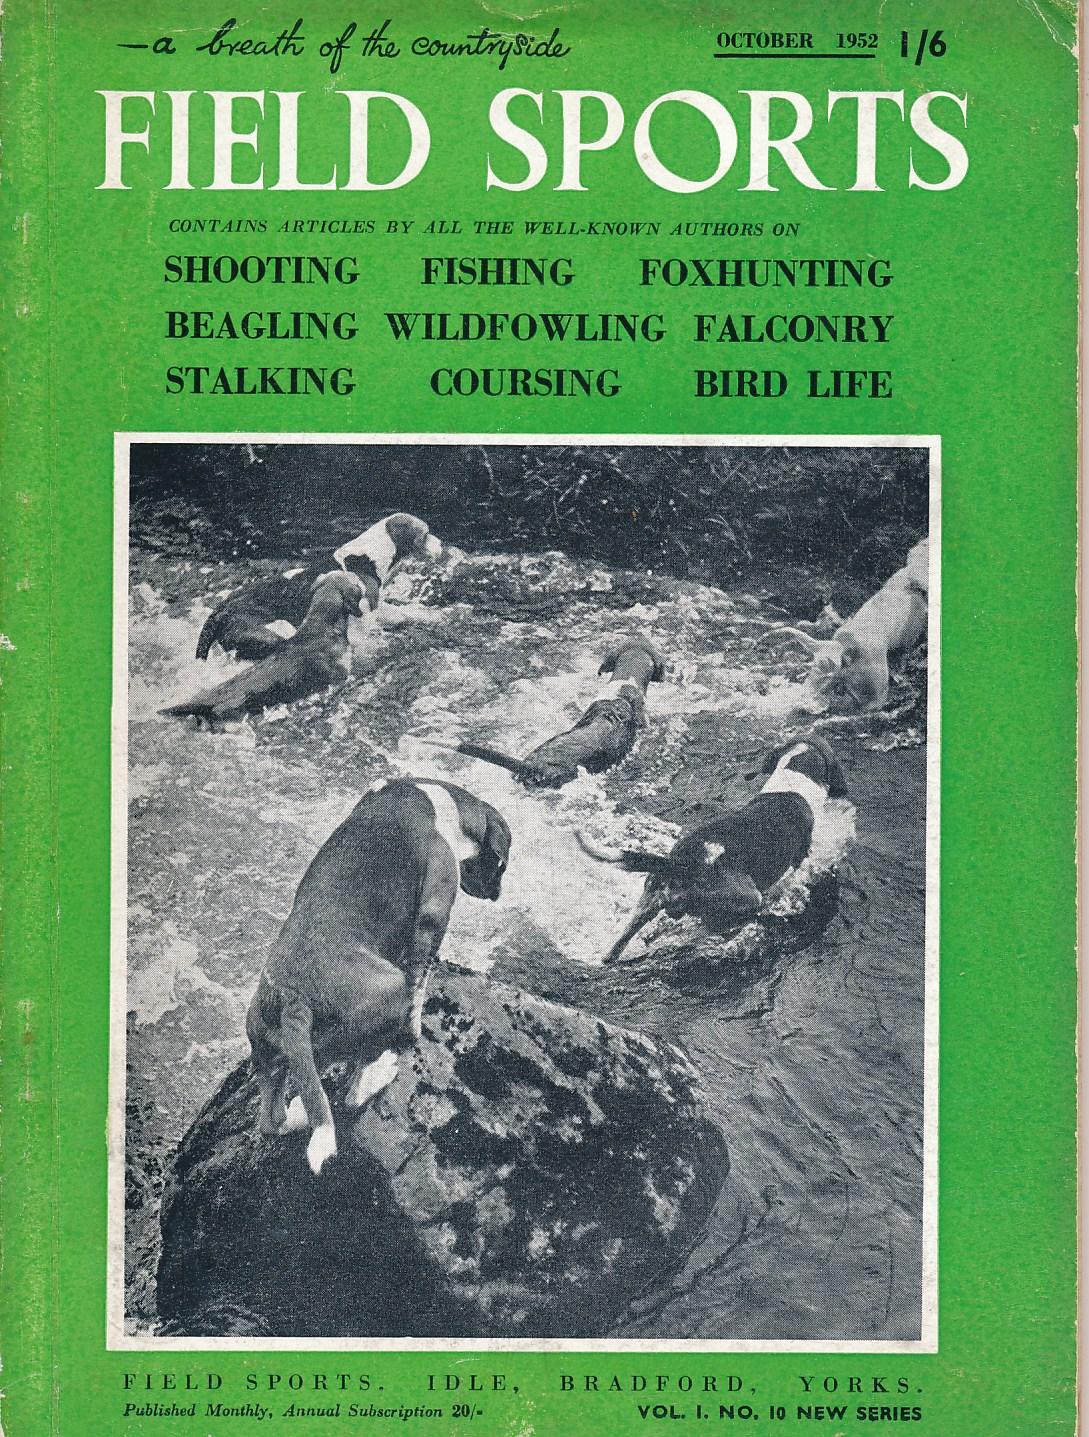 EDITOR - Field Sports Magazine. Volume 1. No. 10 New Series. October 1952